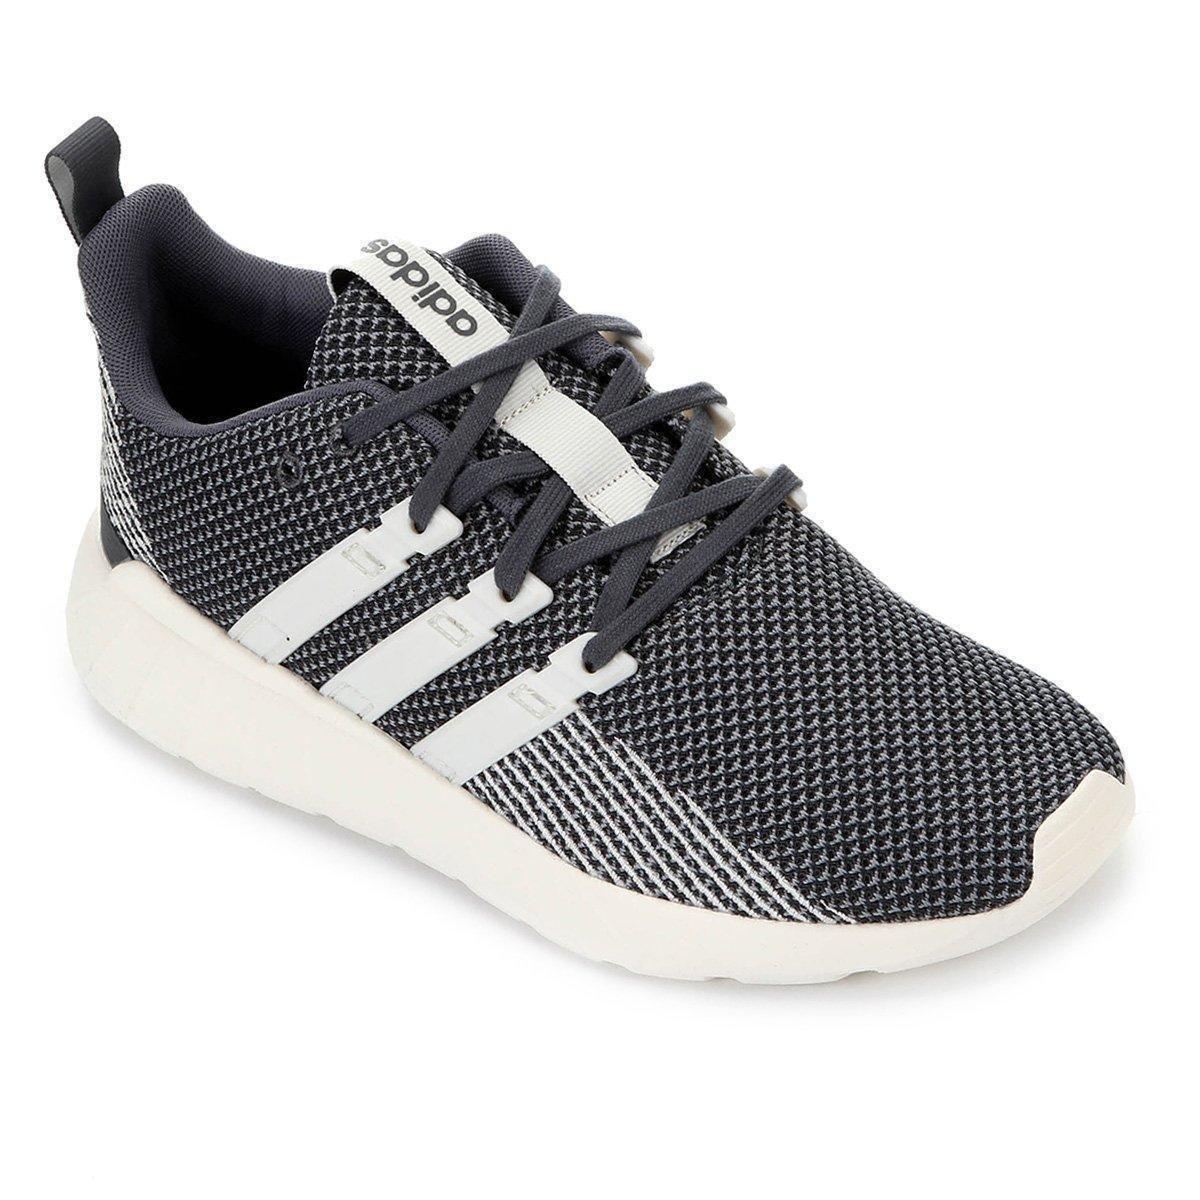 Tênis Adidas Questar Flow Masculino Cinza